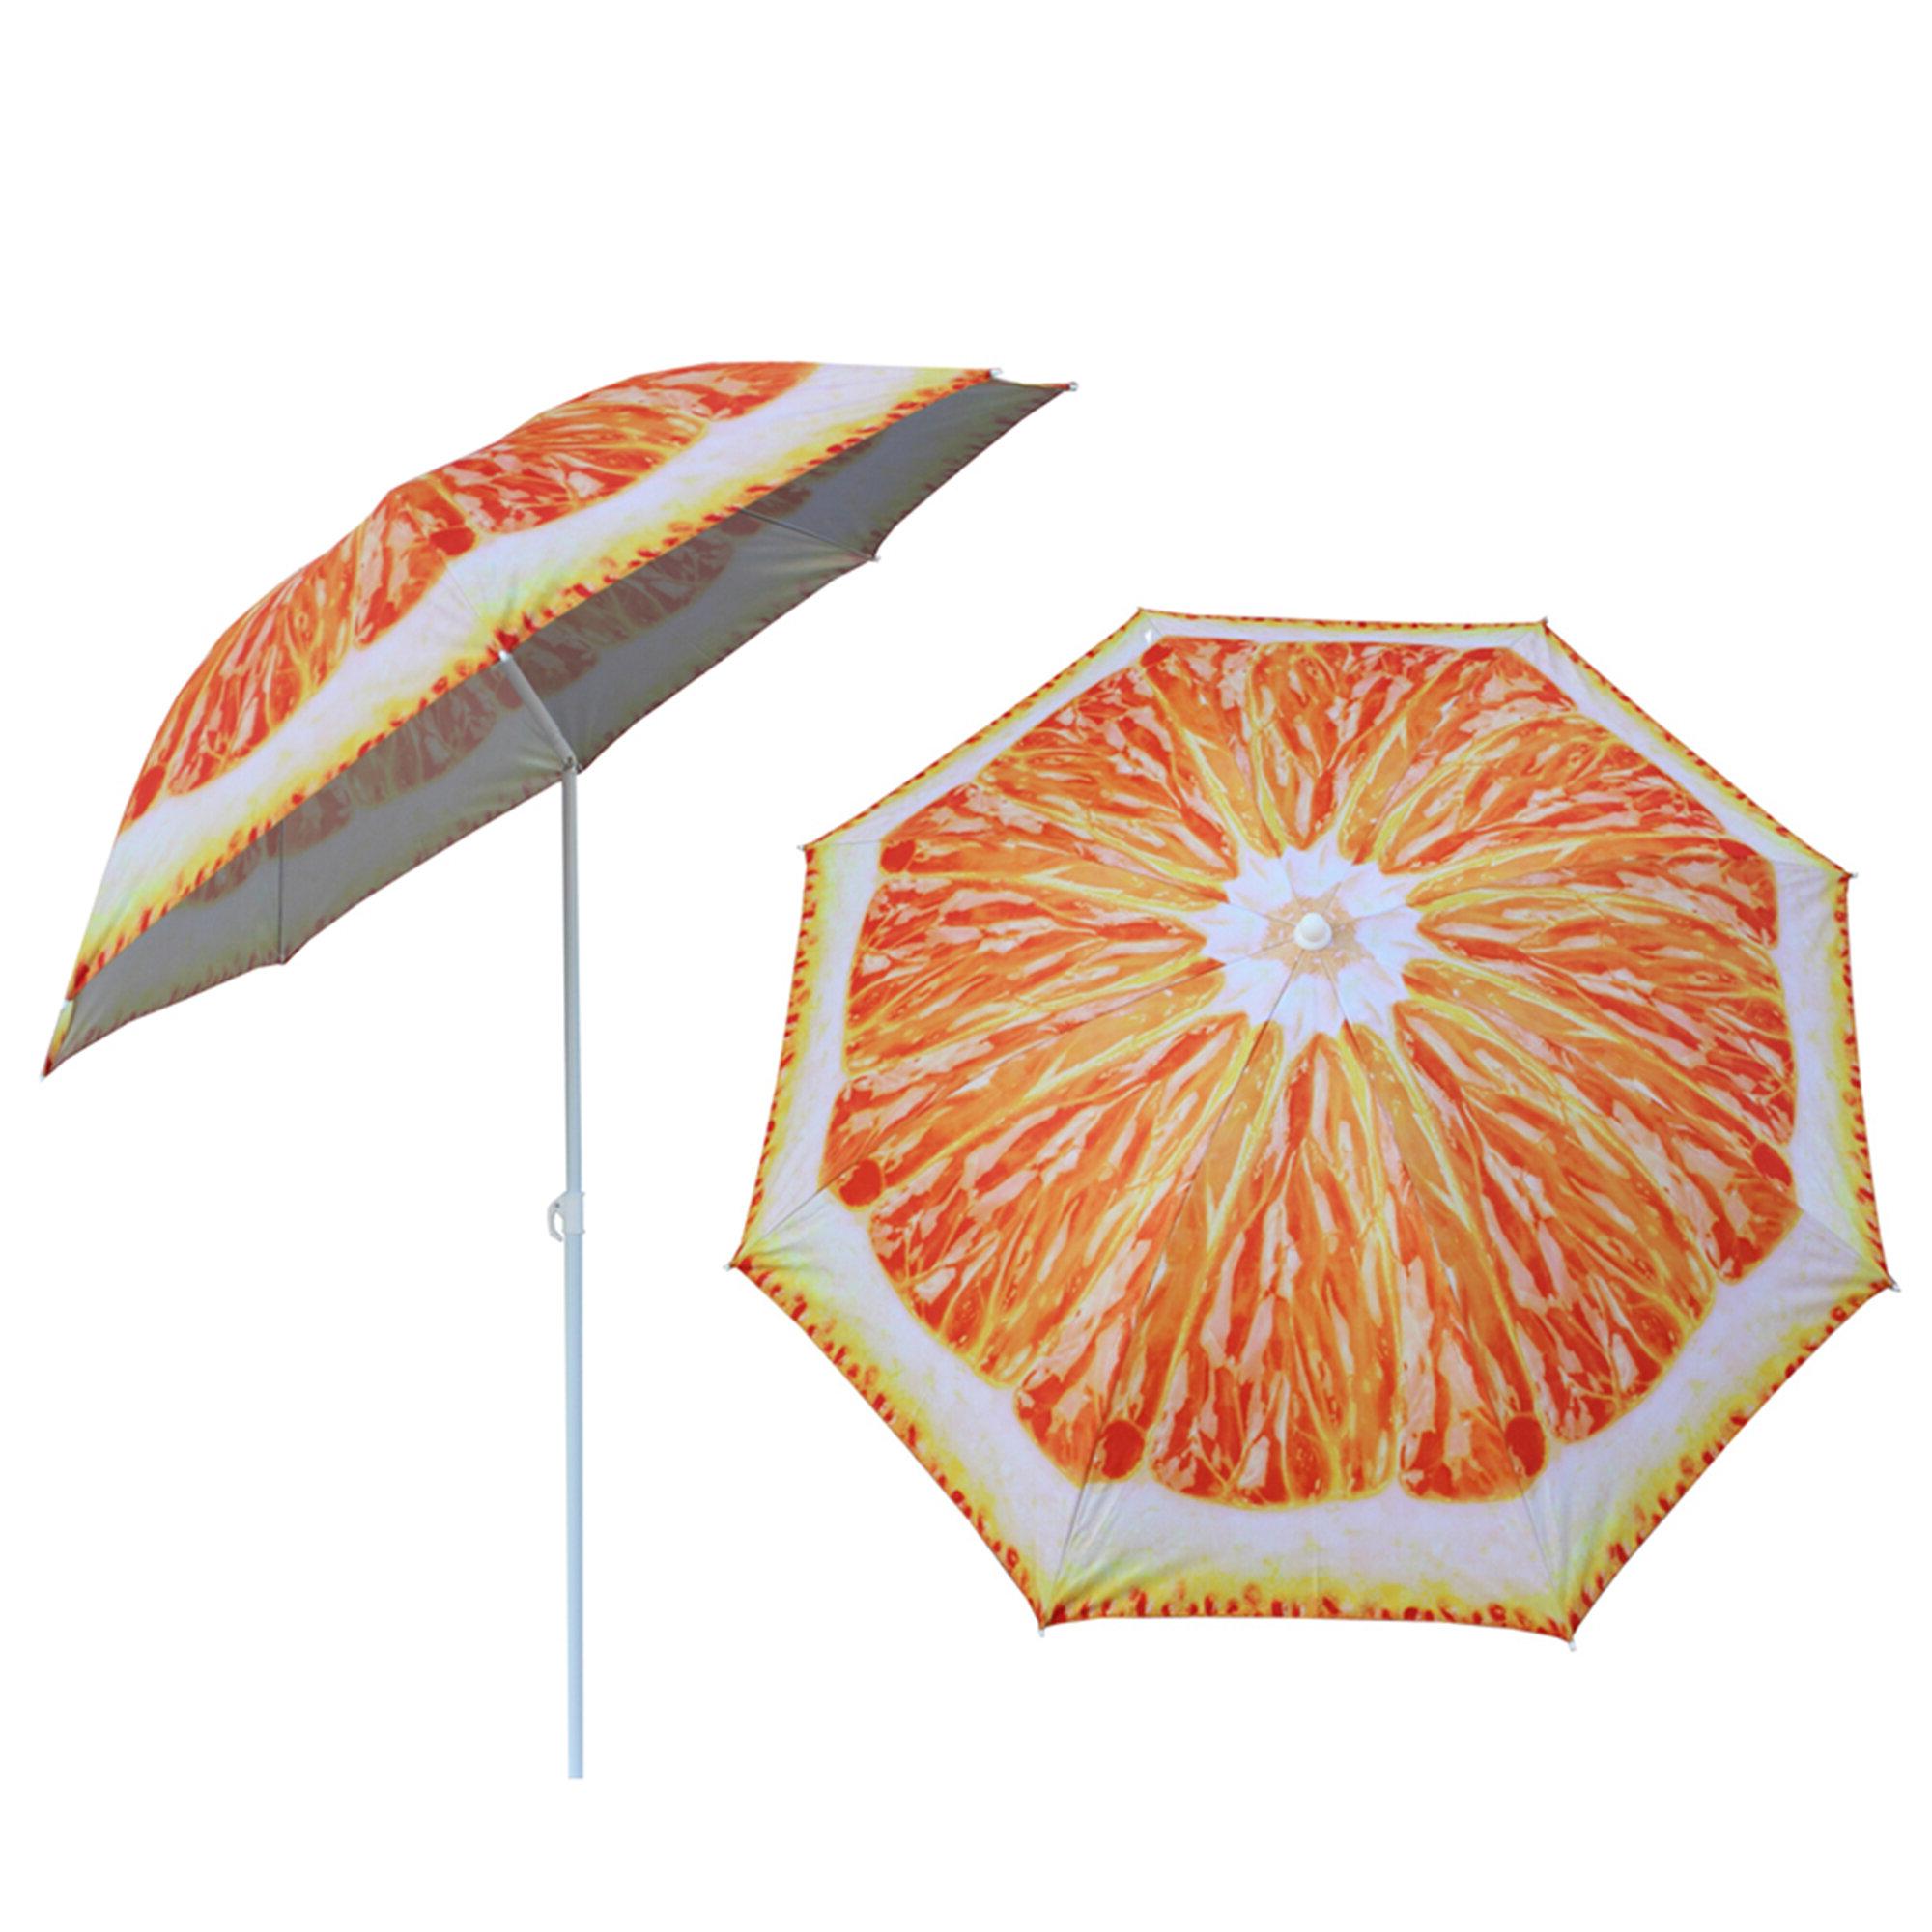 "Zuniga 5'2"" Beach Umbrella In Well Known Capra Beach Umbrellas (View 20 of 20)"